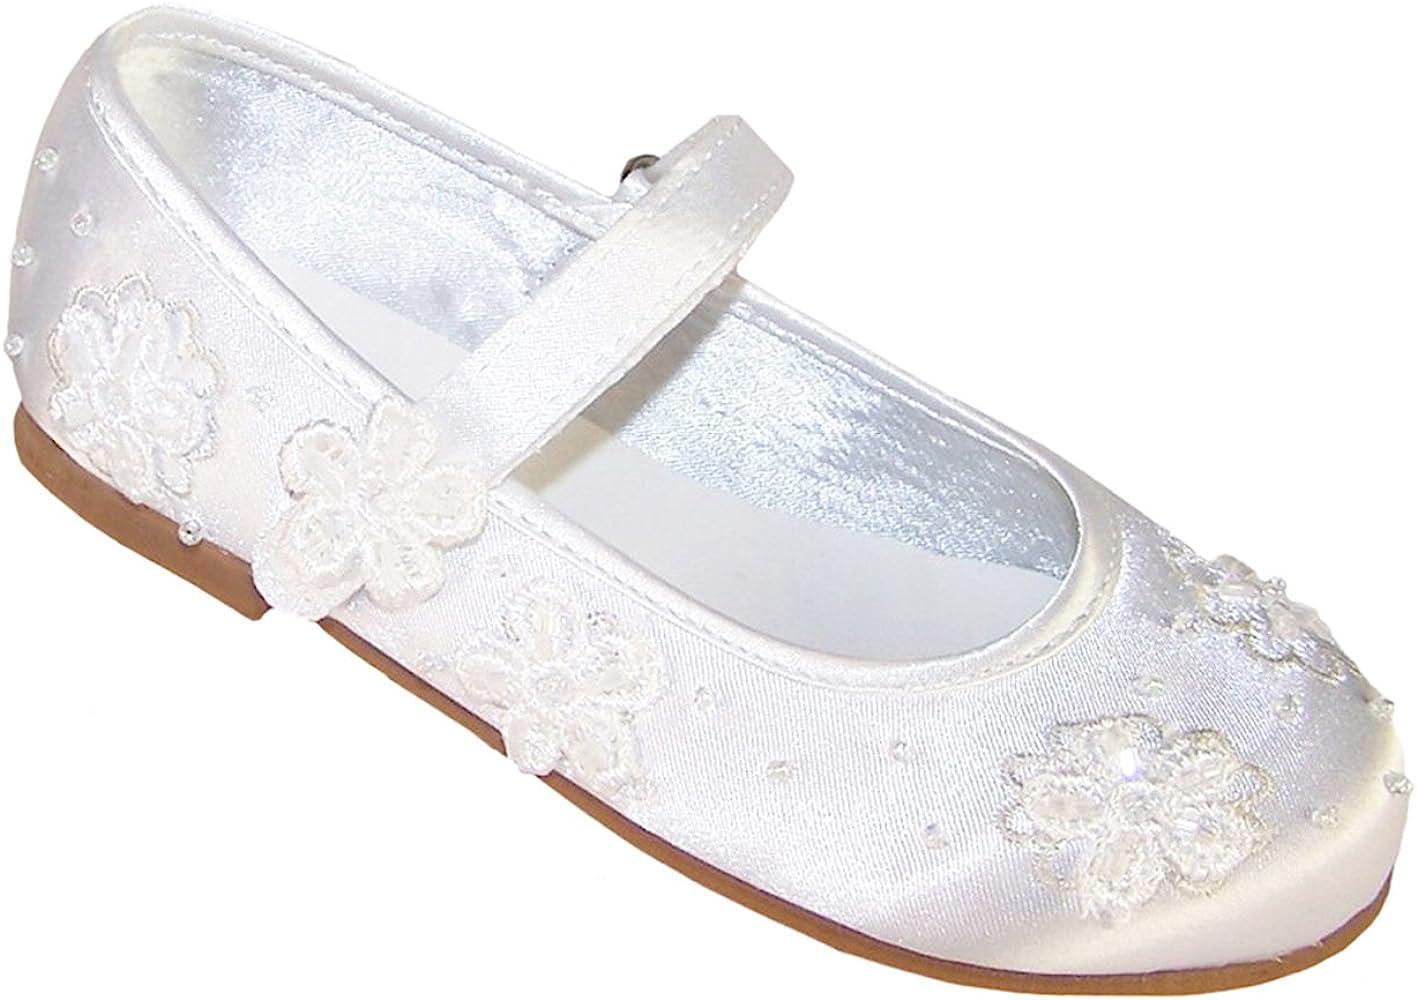 white girls size 3 communion shoes